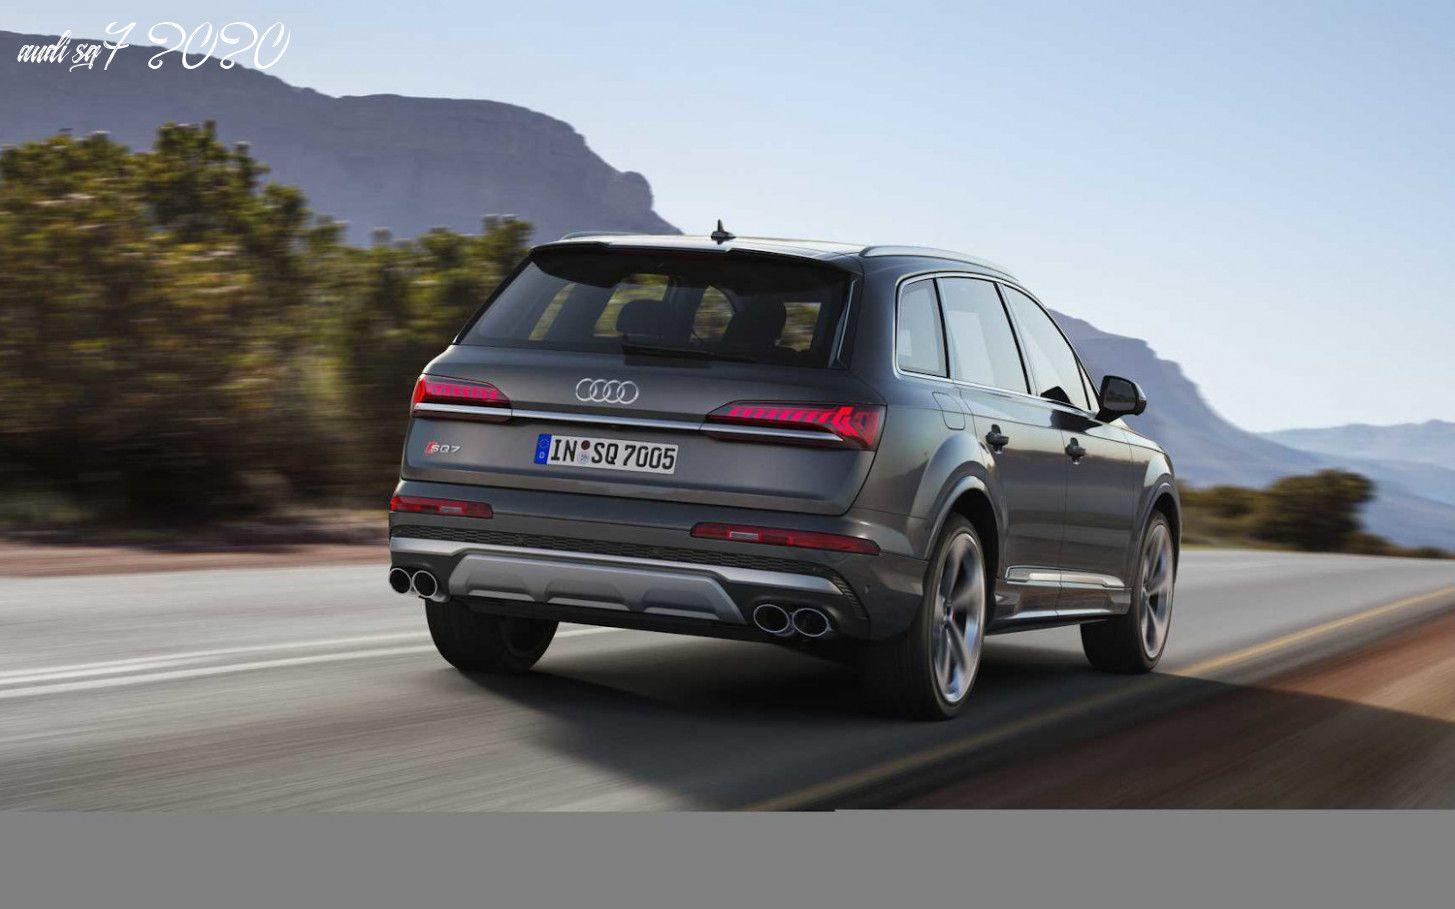 Audi Sq7 2020 In 2020 Audi Usa Luxury Suv Audi Q7